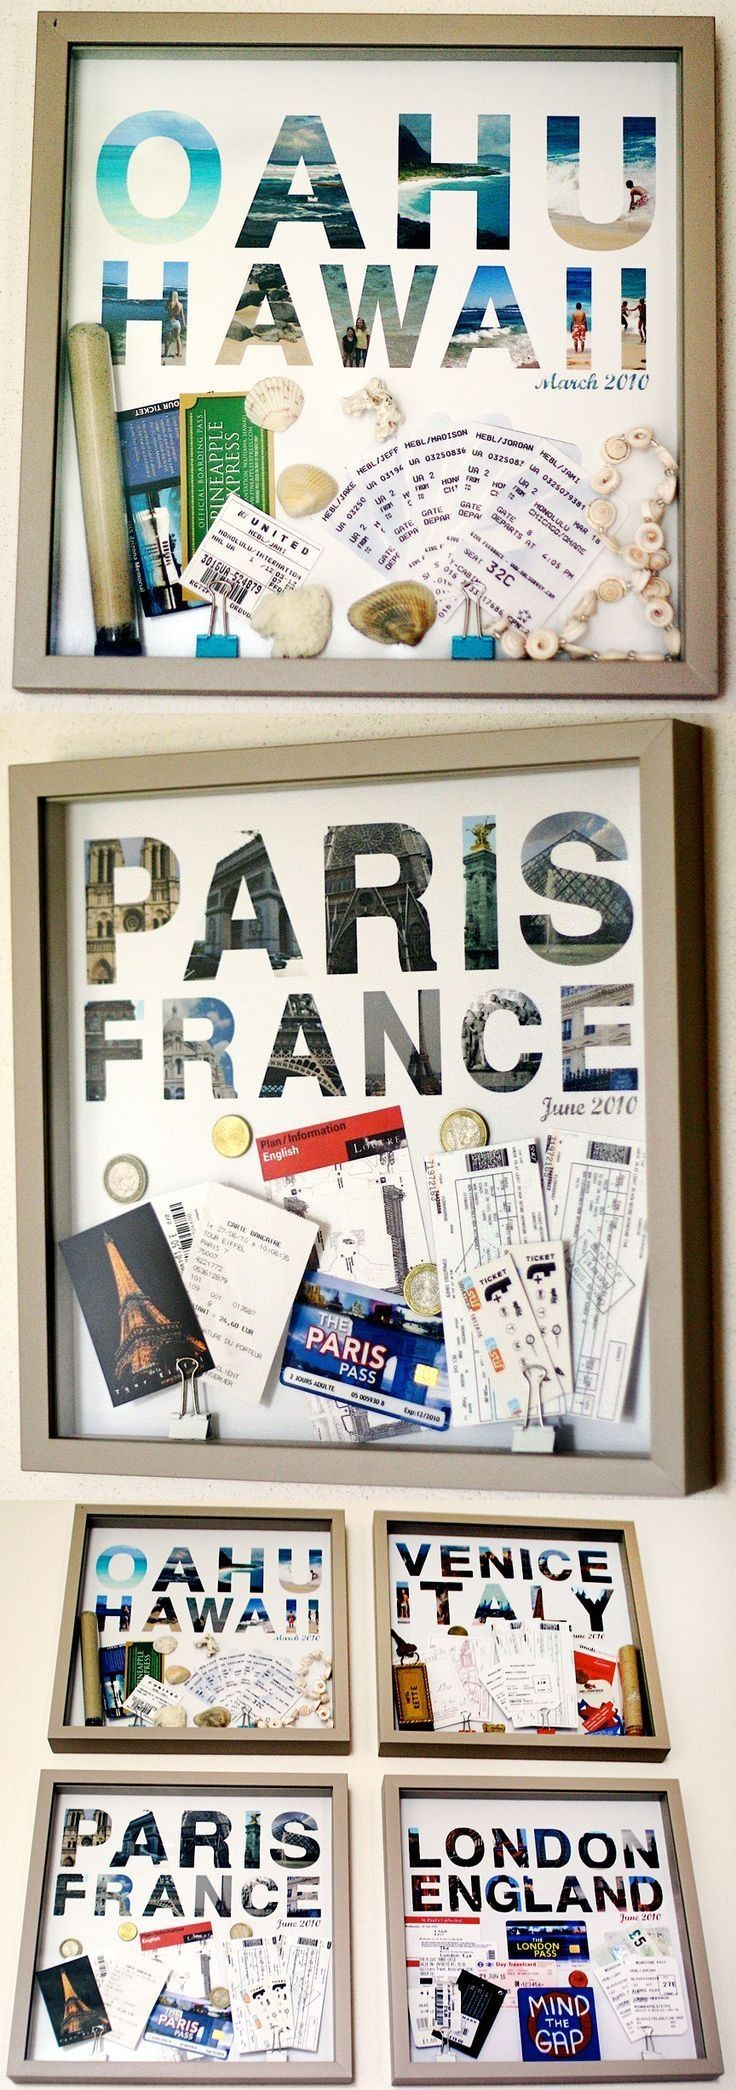 Love this idea for travel memories! <3